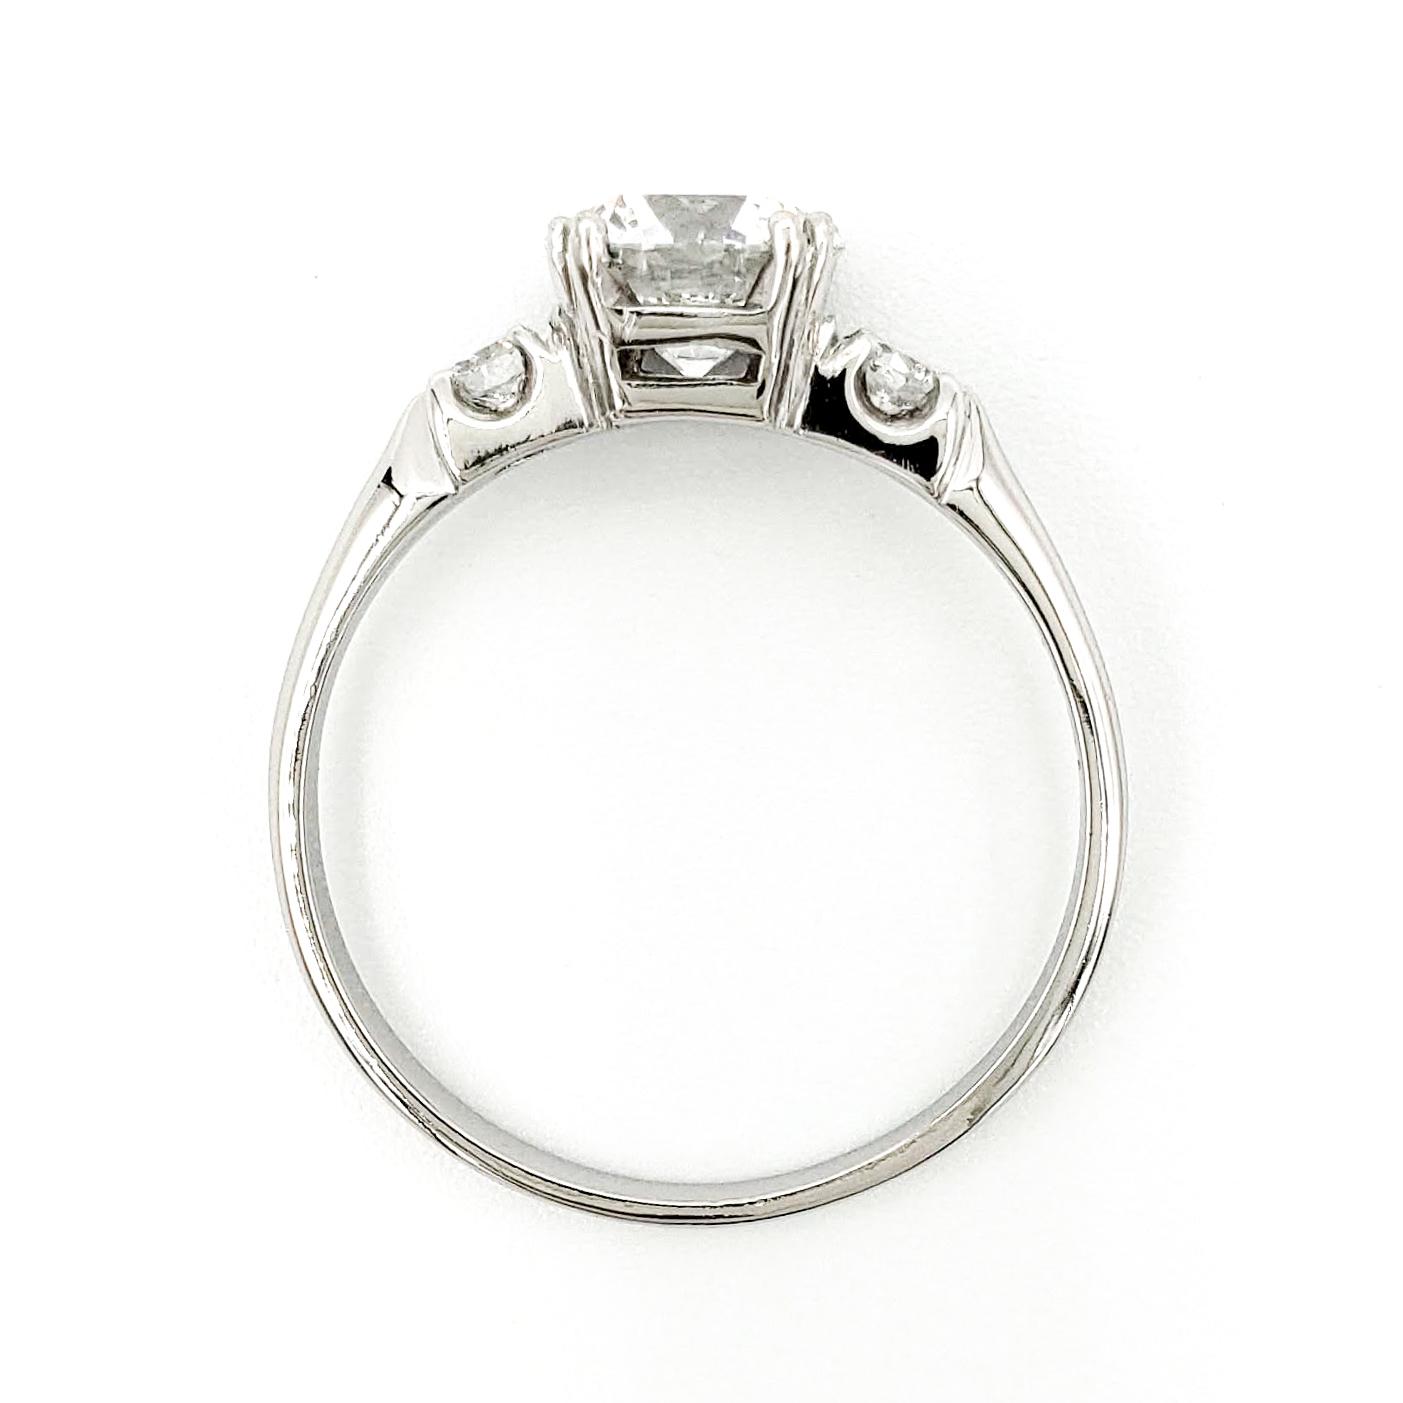 vintage-platinum-engagement-ring-with-1-02-carat-round-brilliant-cut-diamond-gia-g-si2